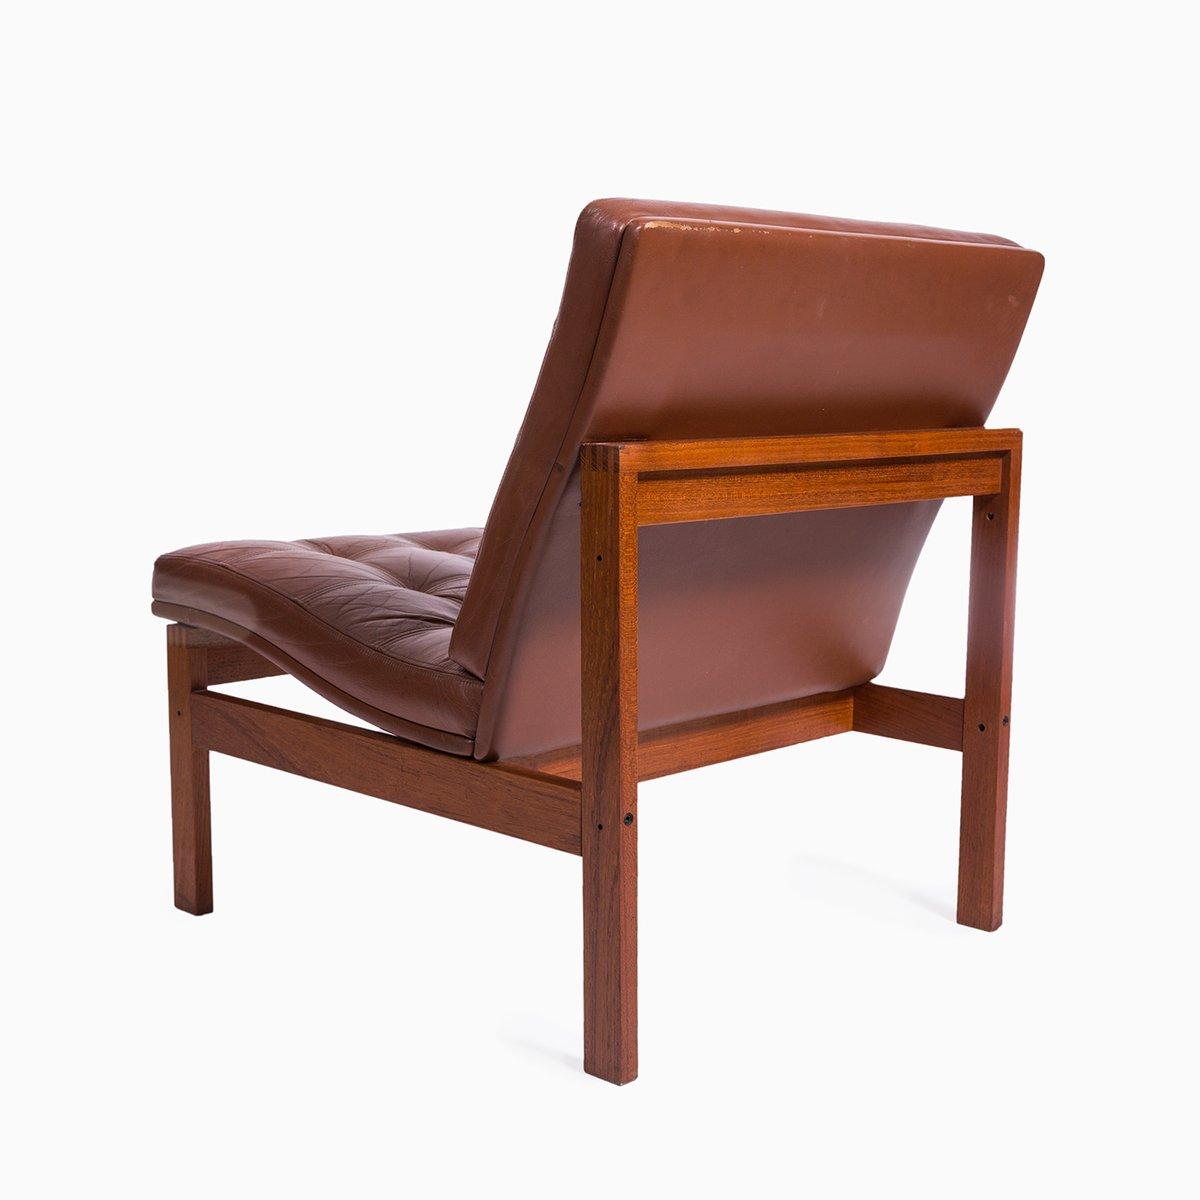 vintage ledersessel von cado bei pamono kaufen. Black Bedroom Furniture Sets. Home Design Ideas